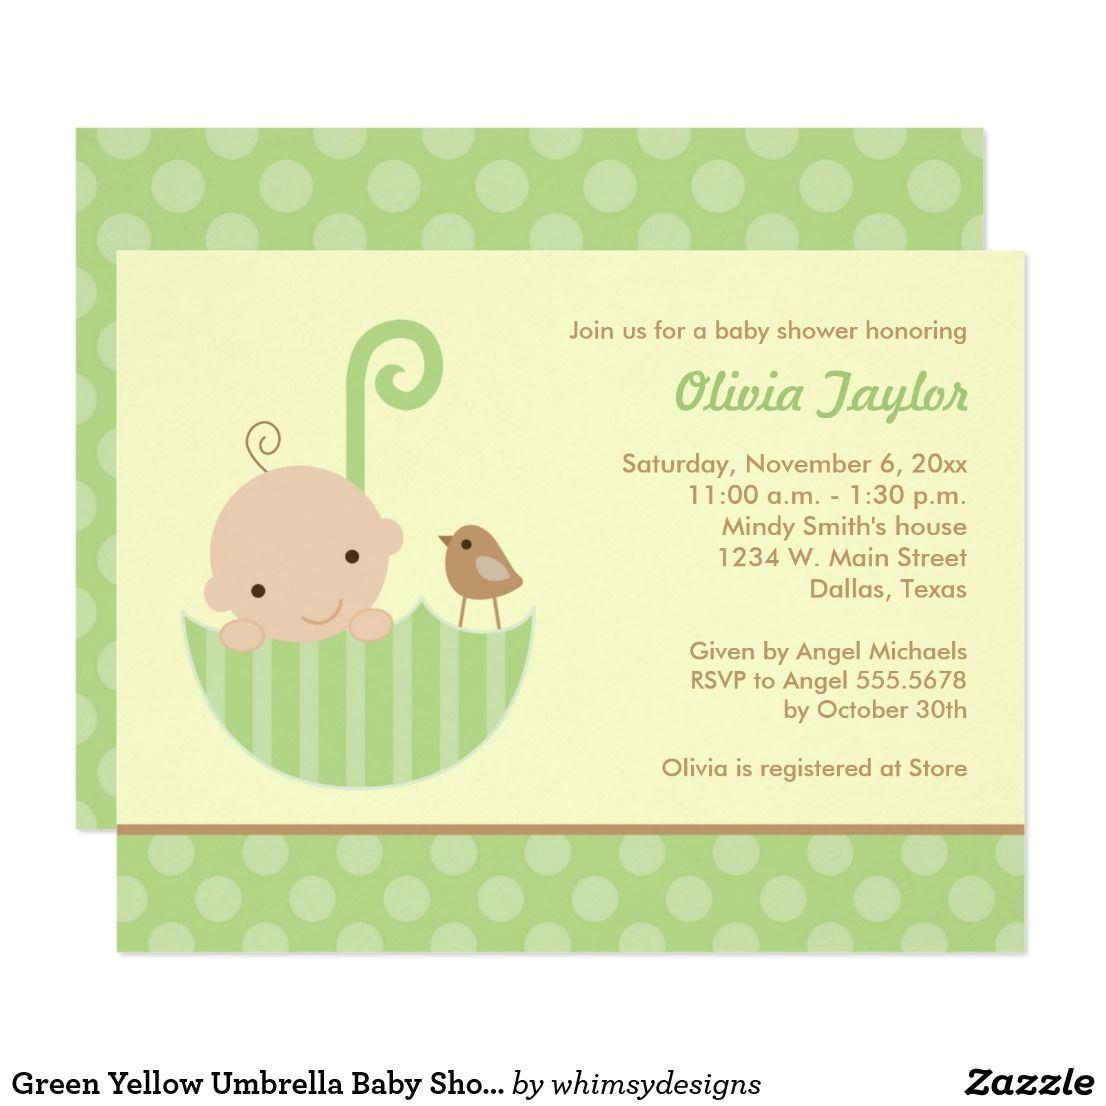 Green Yellow Umbrella Baby Shower Invitations   Umbrella baby ...